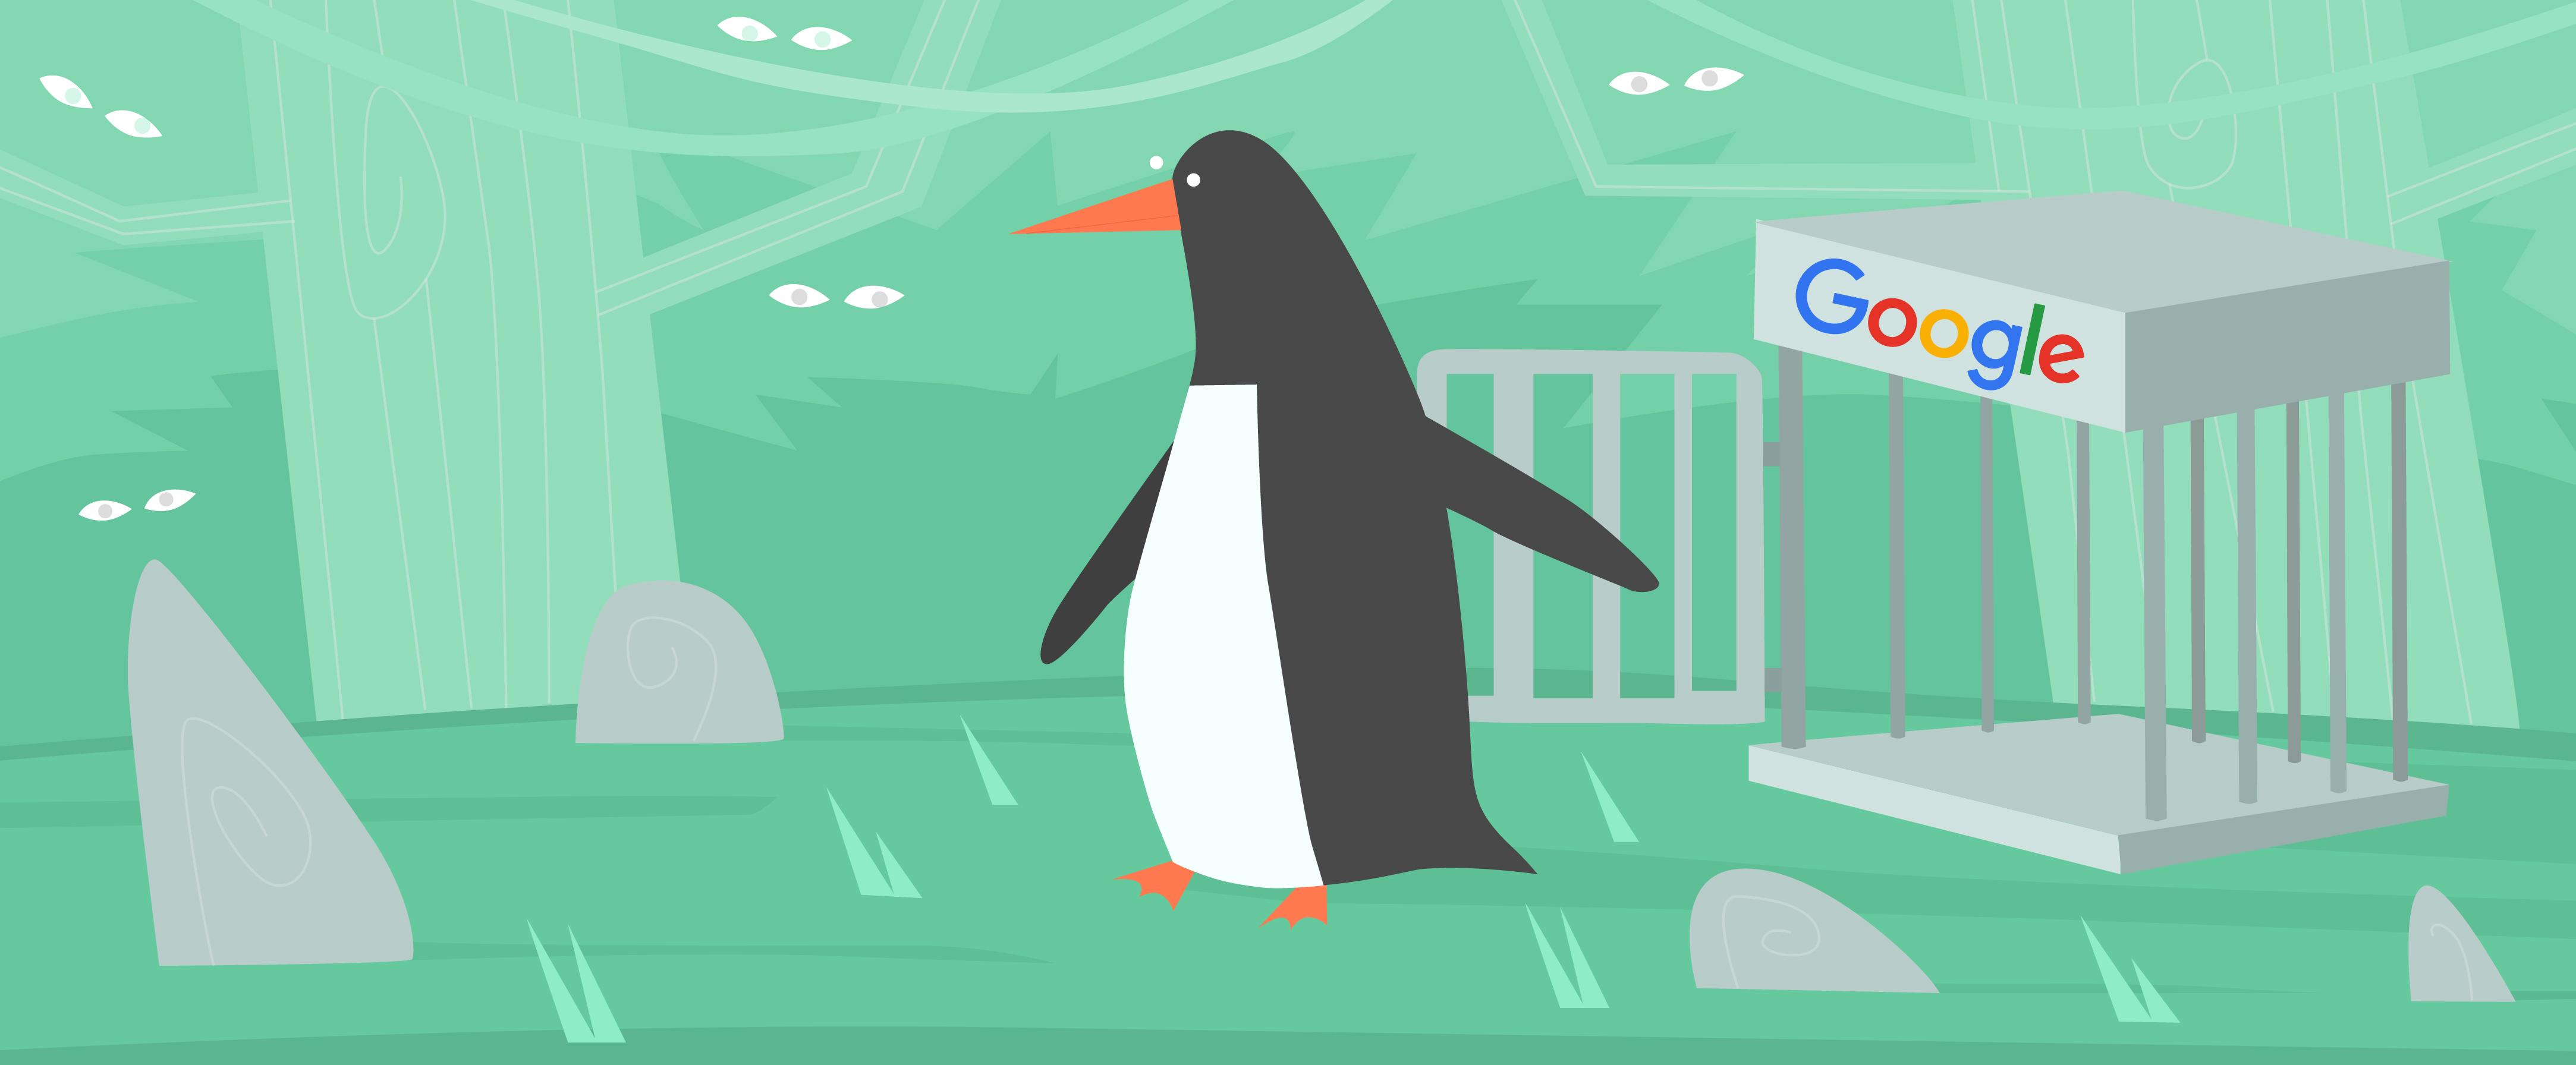 Google Penguin 4.0 Released Into The Wild